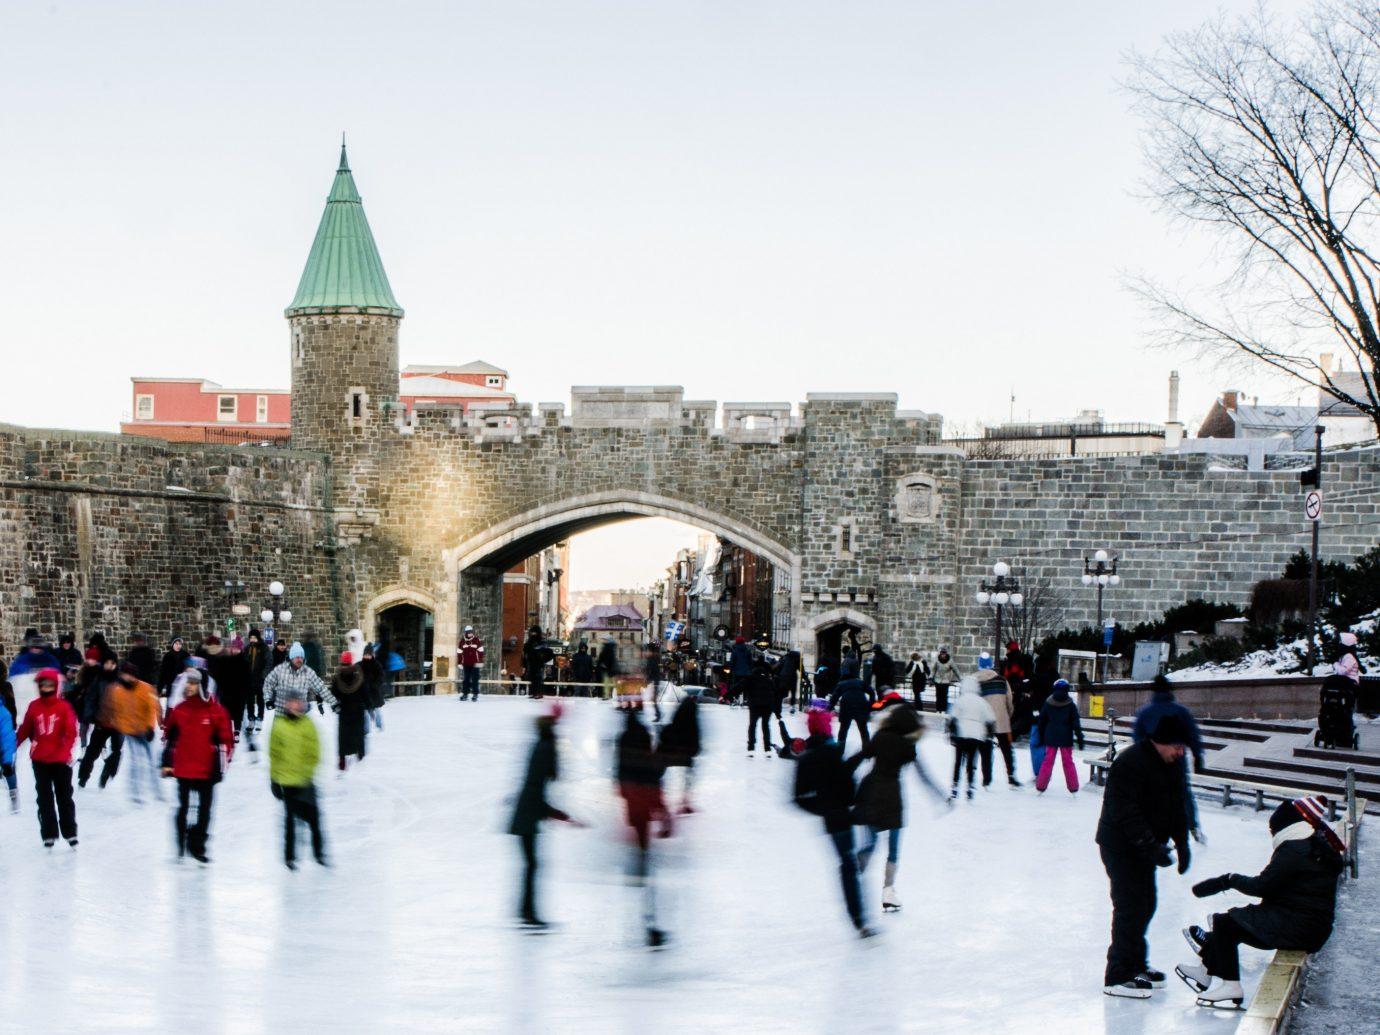 Quebec City outdoor ice rink in winter